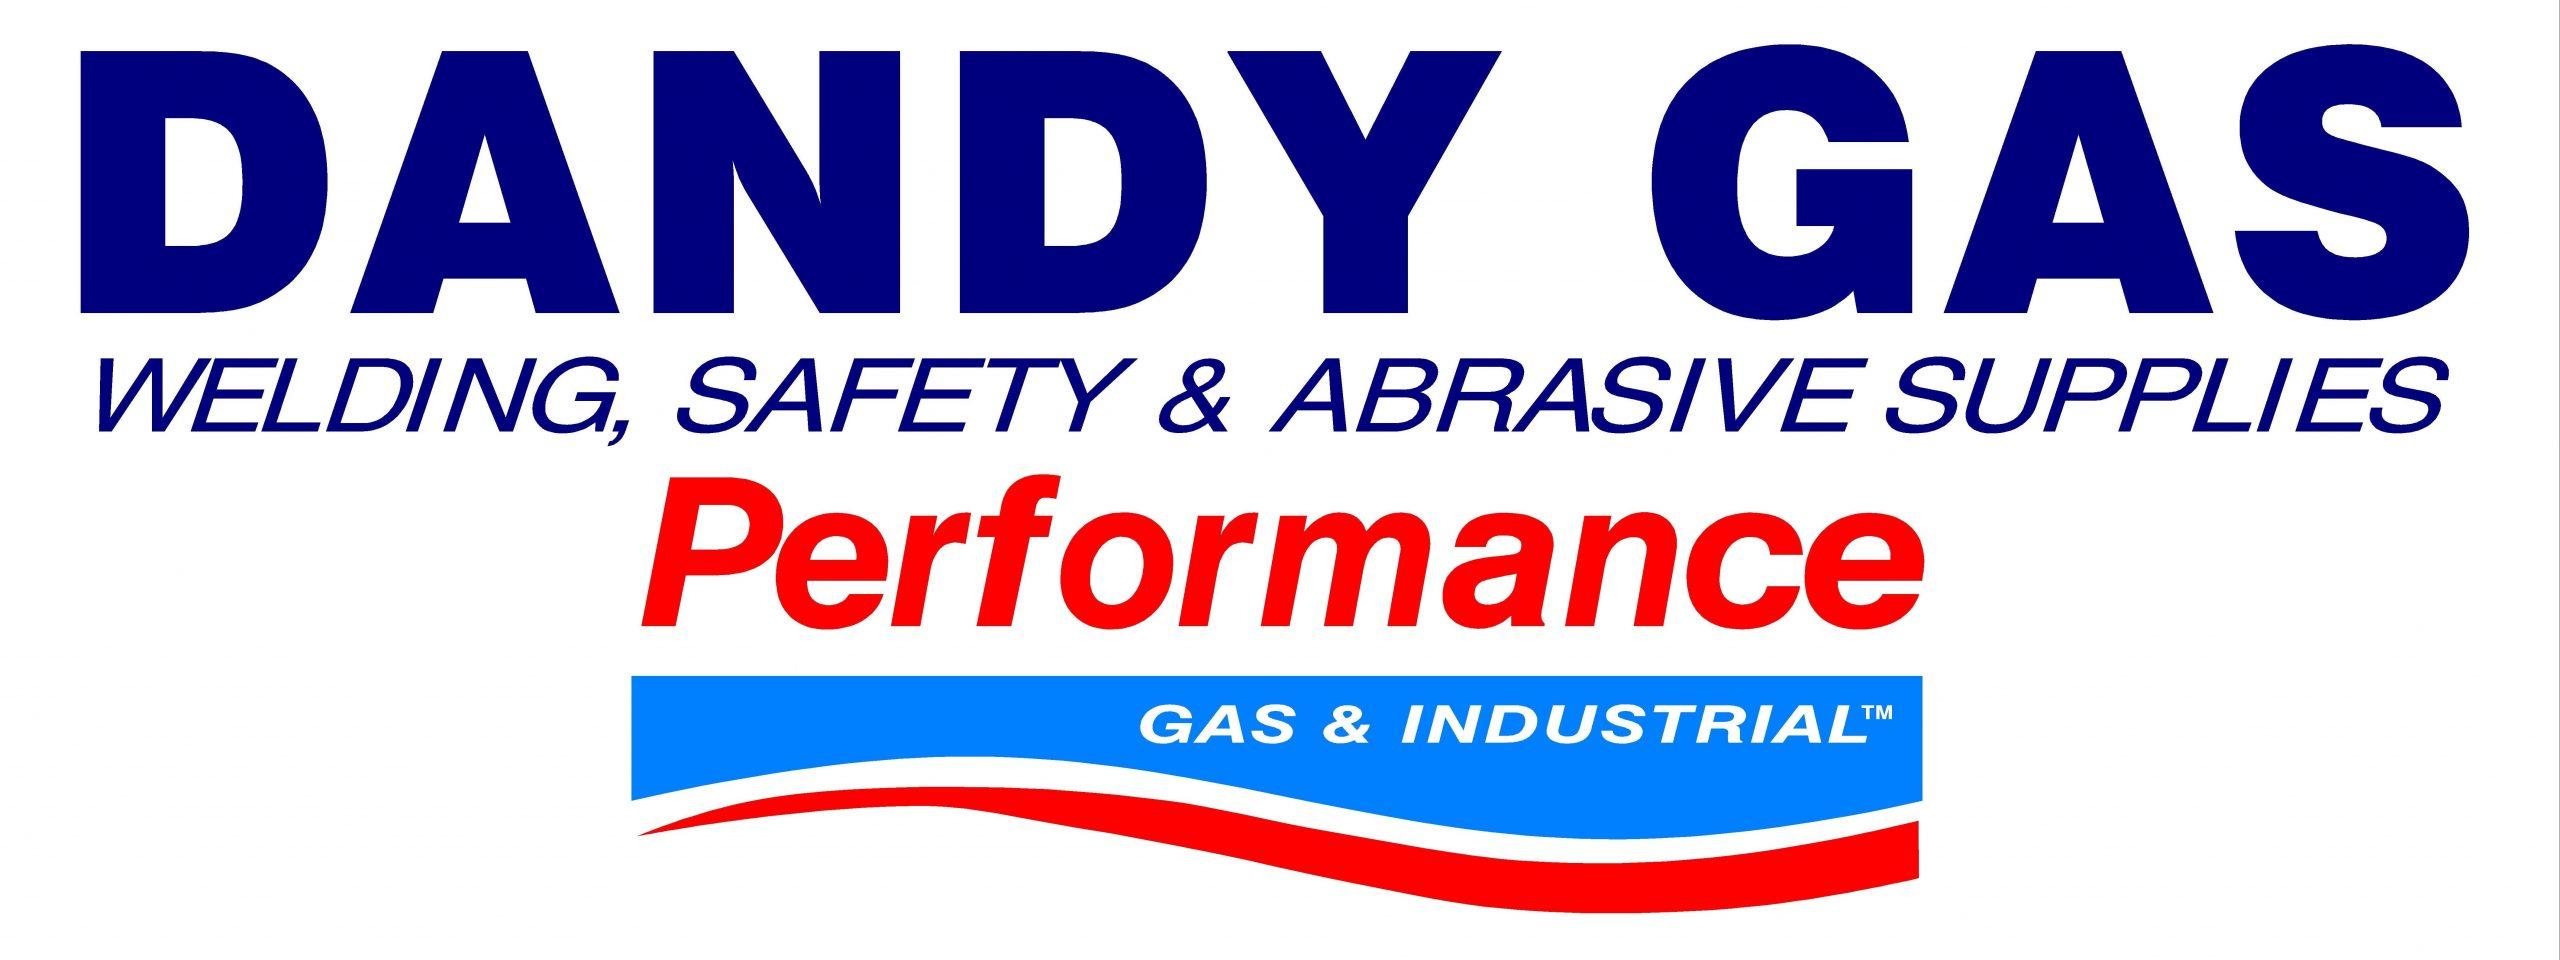 Dandy Gas Logo 2_SLAC